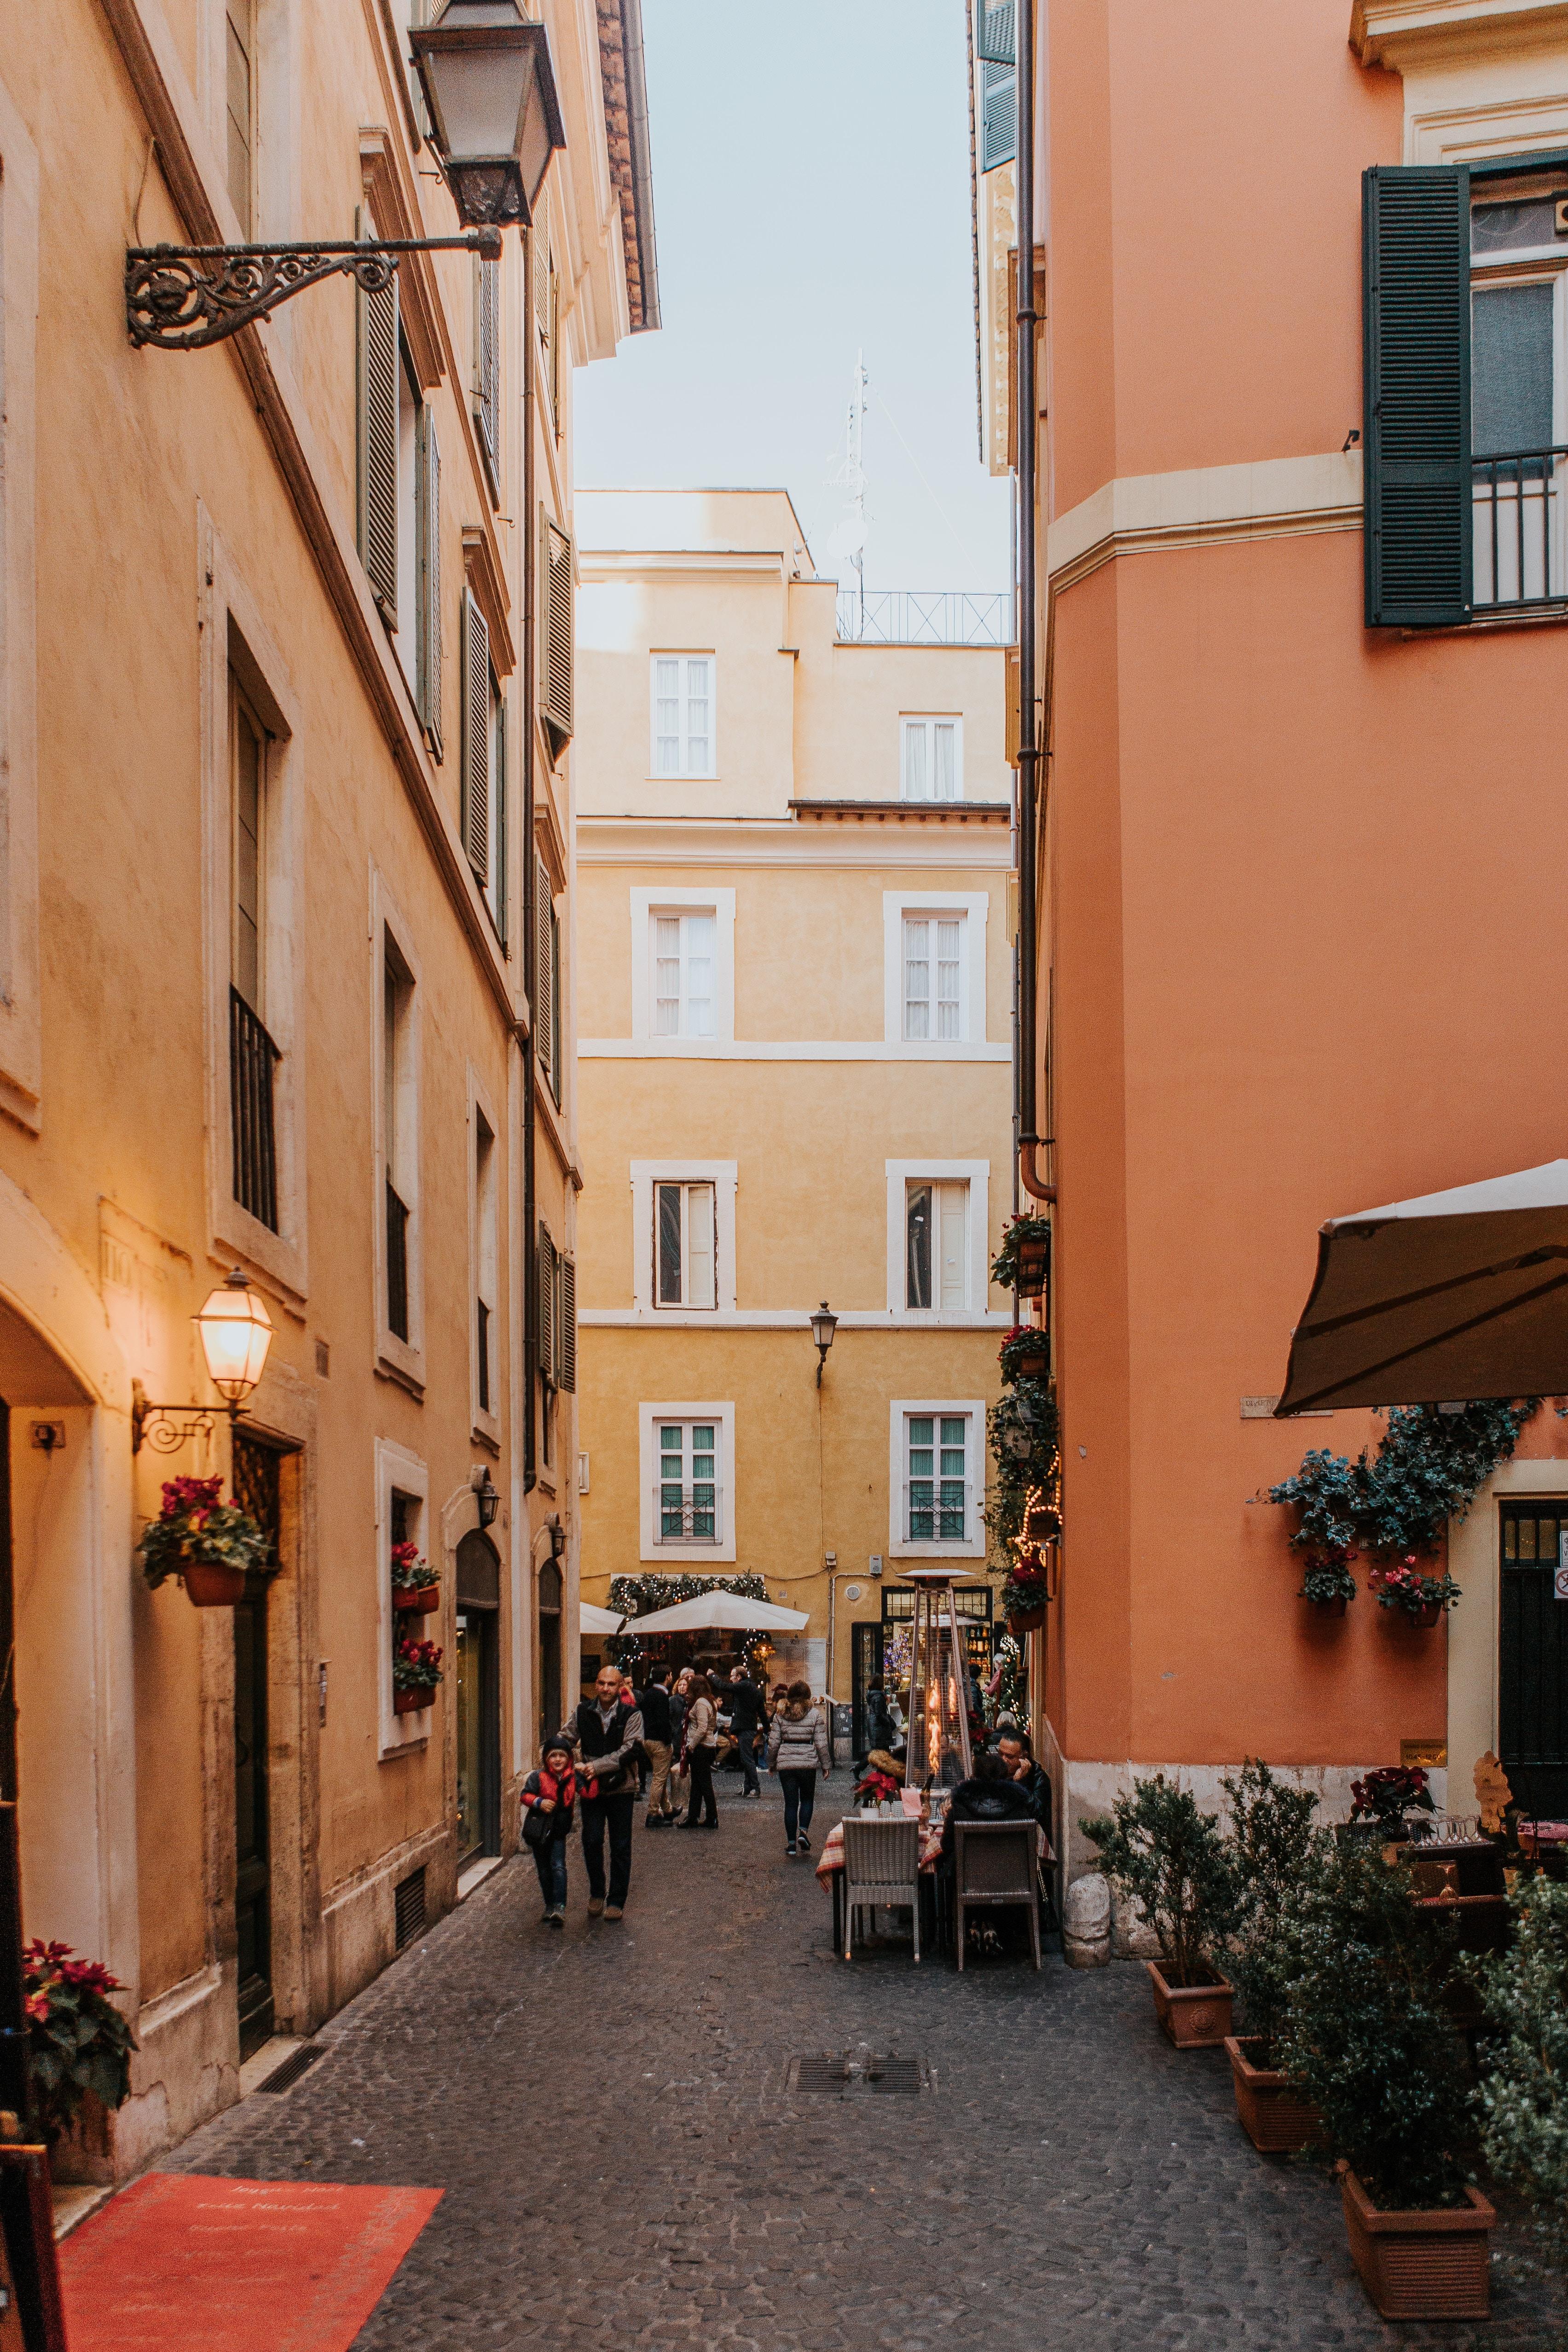 city street during daytime